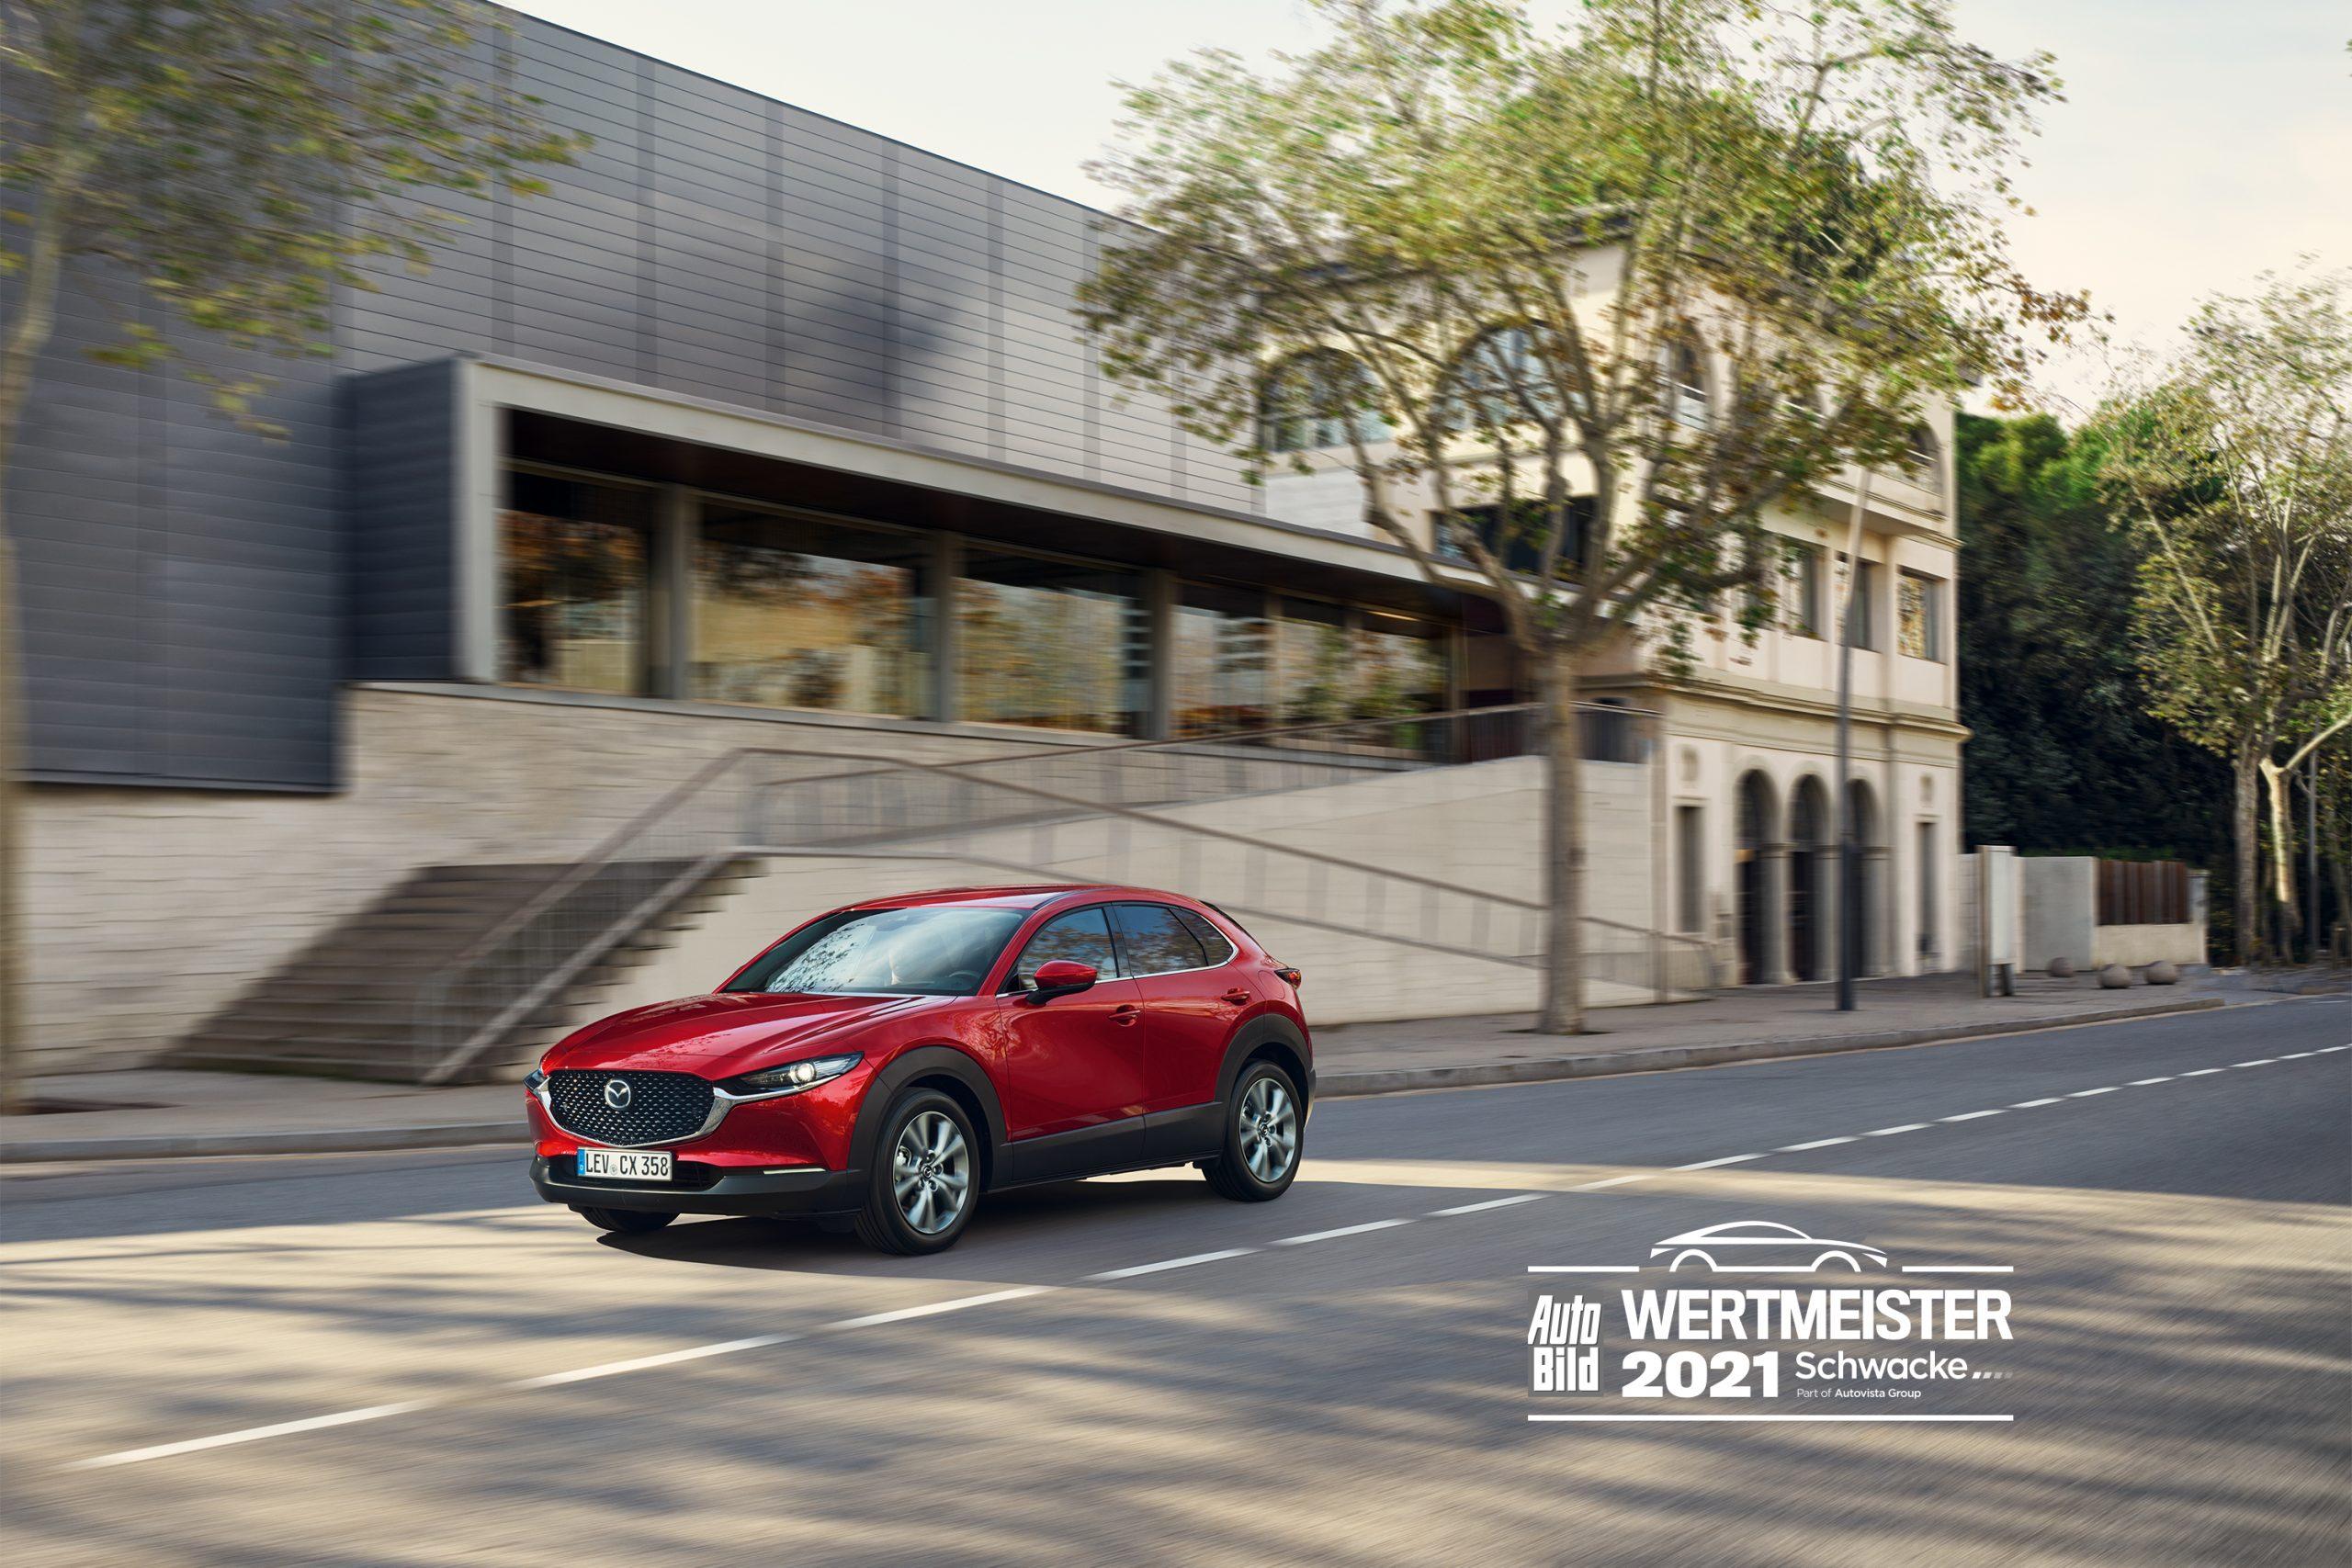 Mazda CX 30 Wertmeister scaled To Mazda CX-30 διατηρεί την τιμή του ως μεταχειρισμένο, λένε οι Γερμανοί Mazda, Mazda CX-30, zblog, βραβείο, μεταχειρισμένα, μεταχειρισμένο